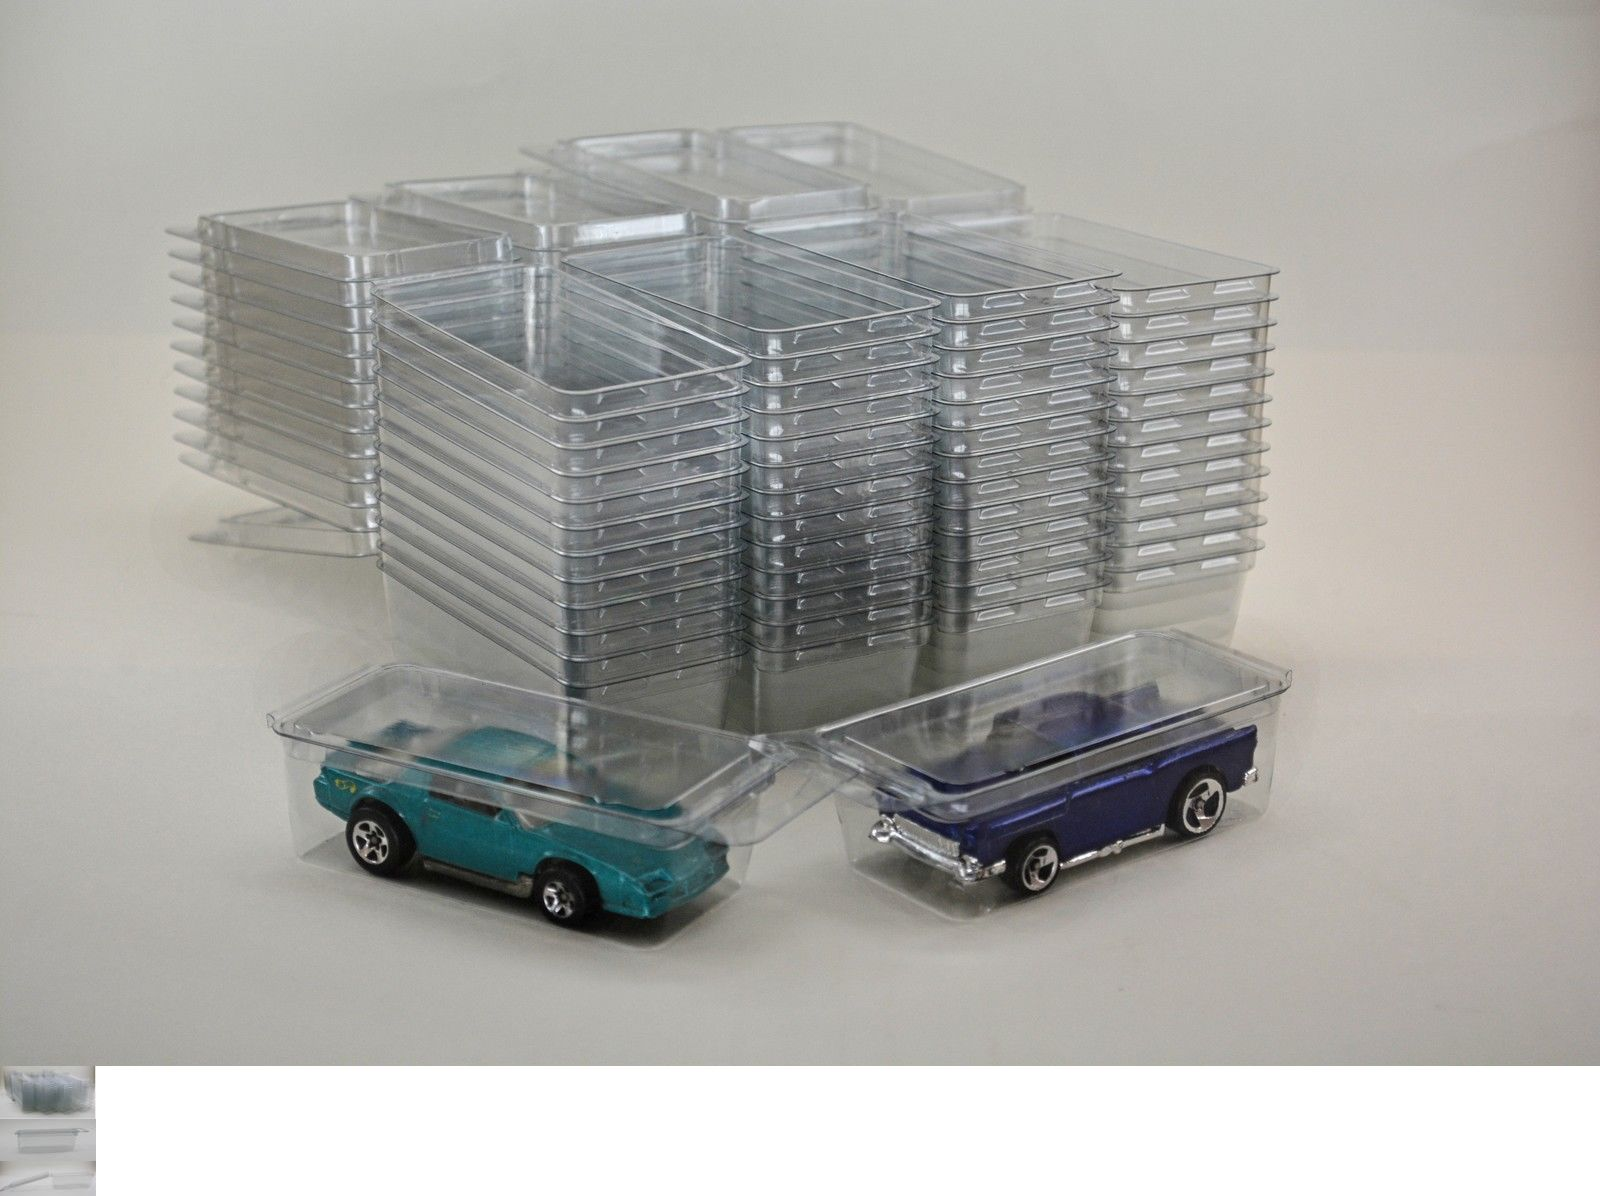 50 Hot Wheels Plastic Car Cases Diecast 1 64 Boxes Brand New Clamshells Hot Wheels Clamshell Box Branding